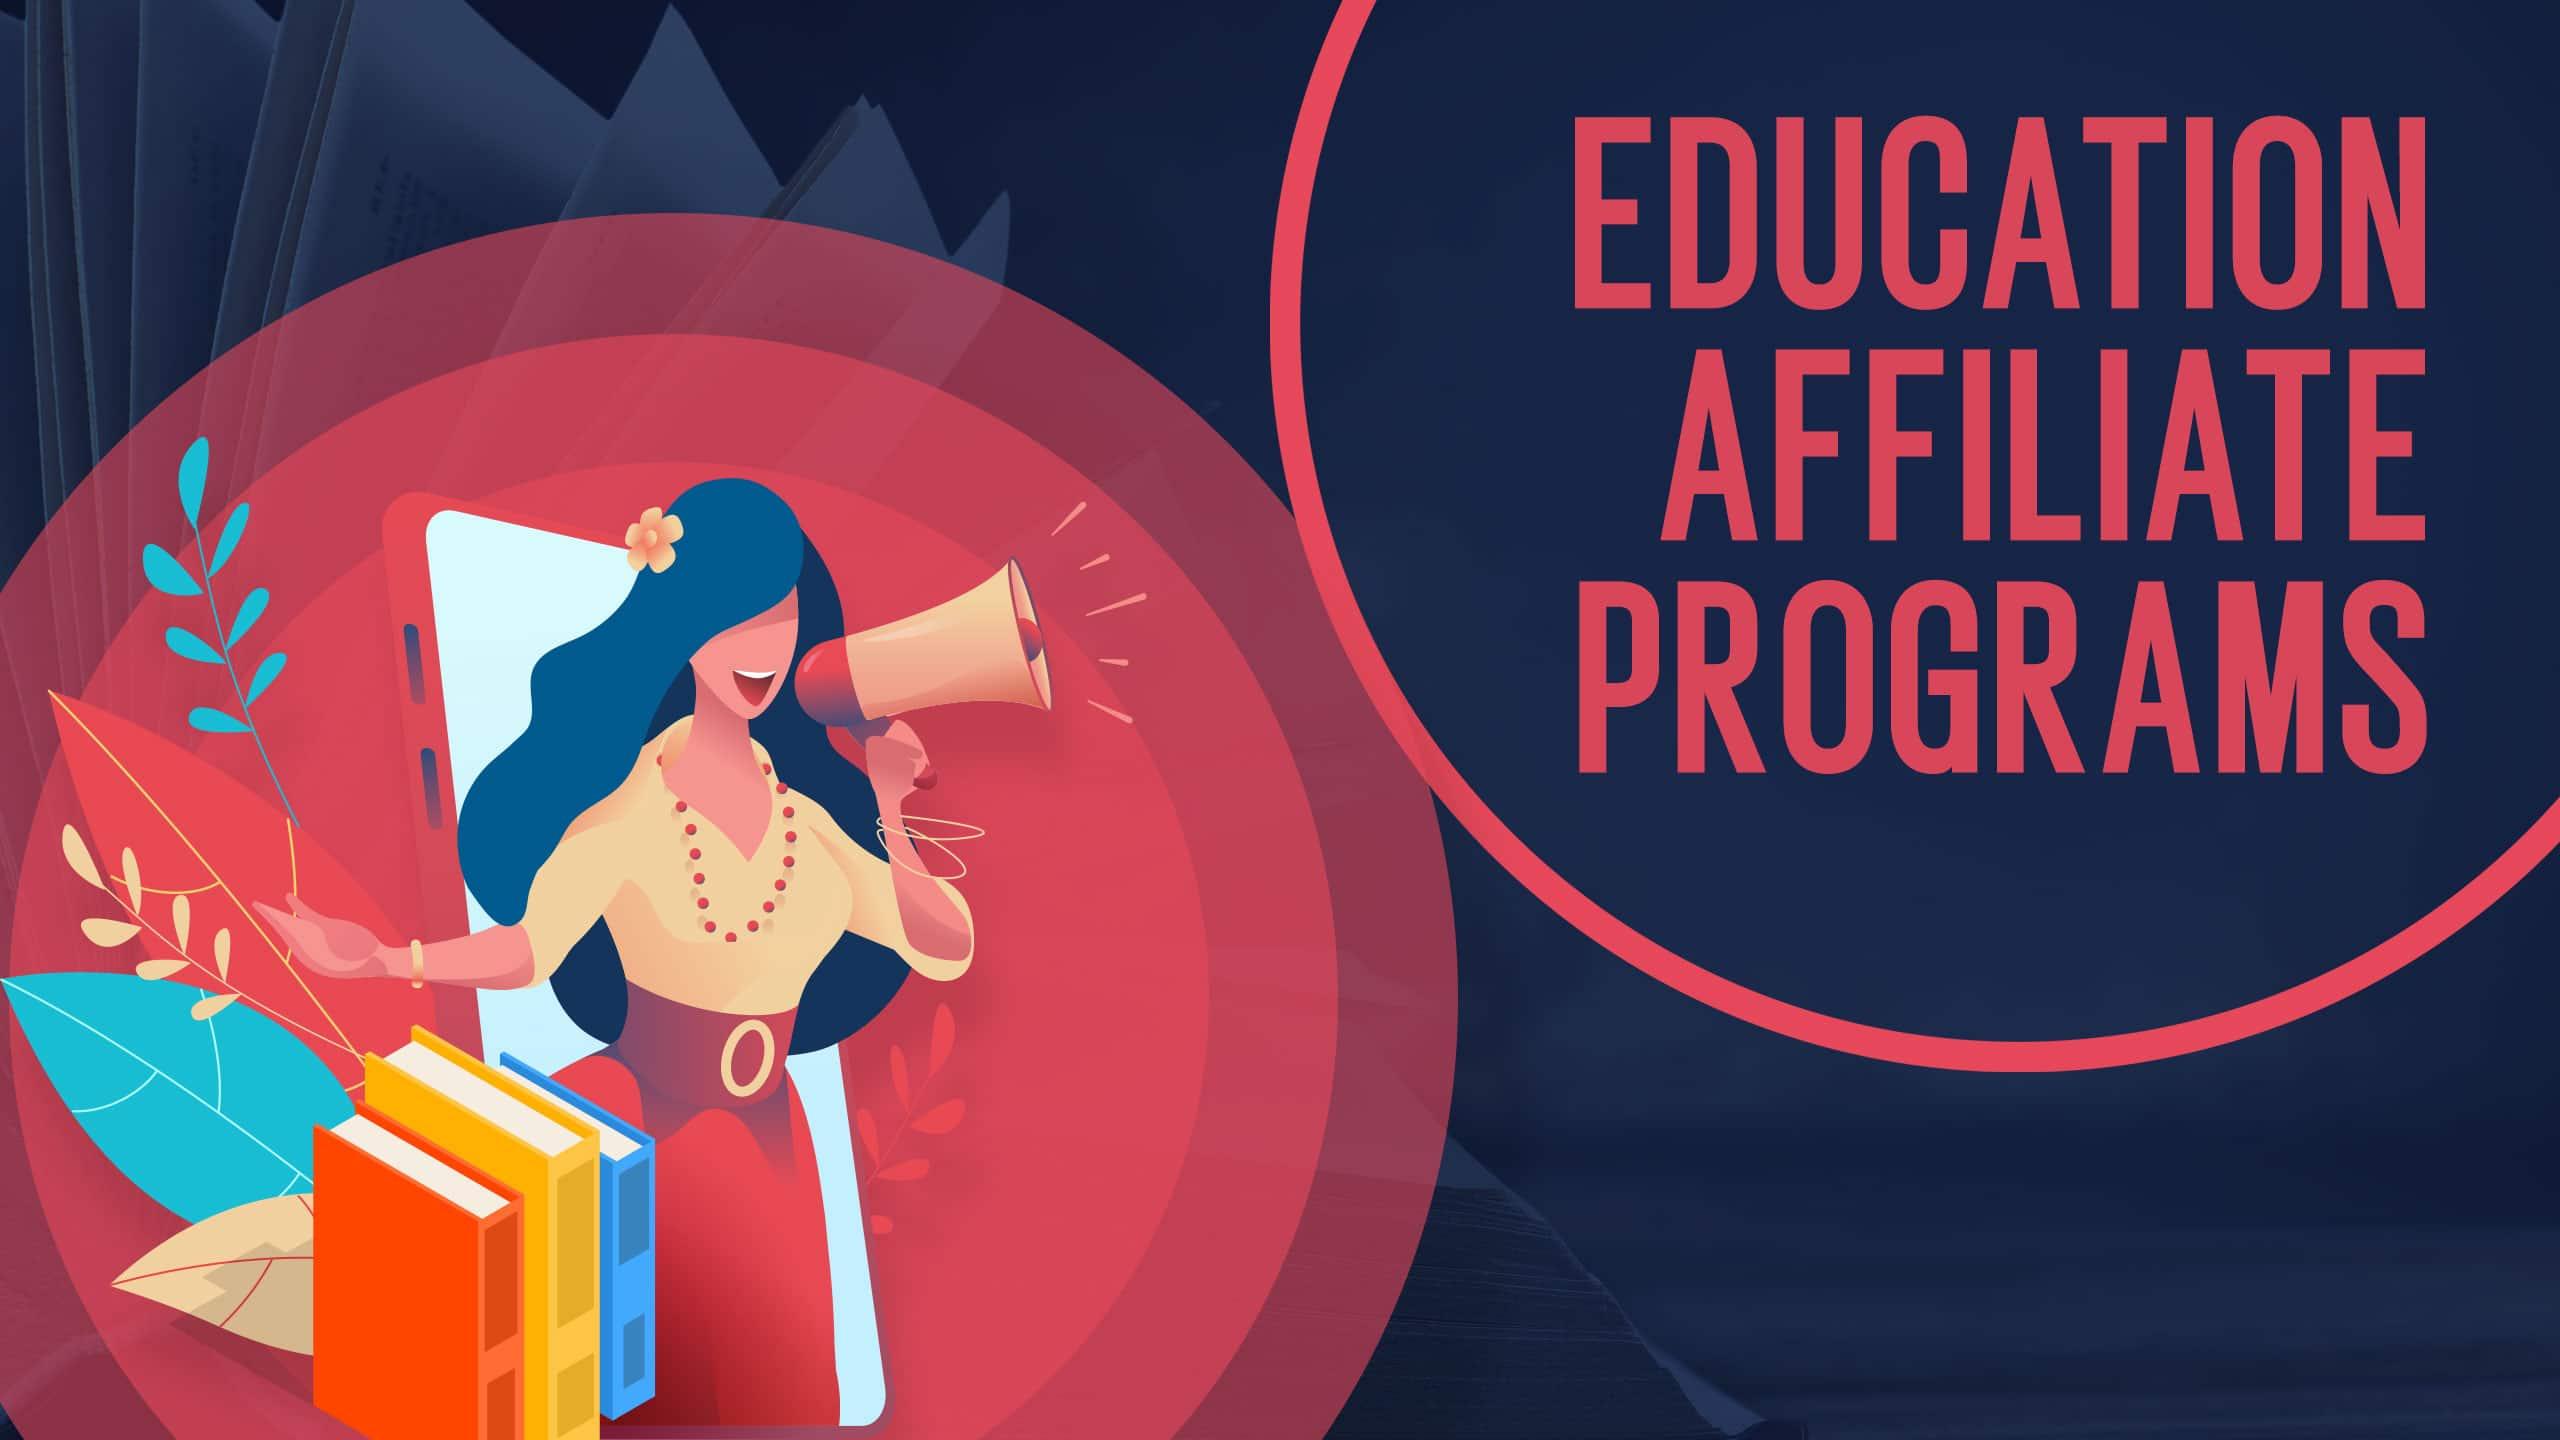 Education Affiliate Programs